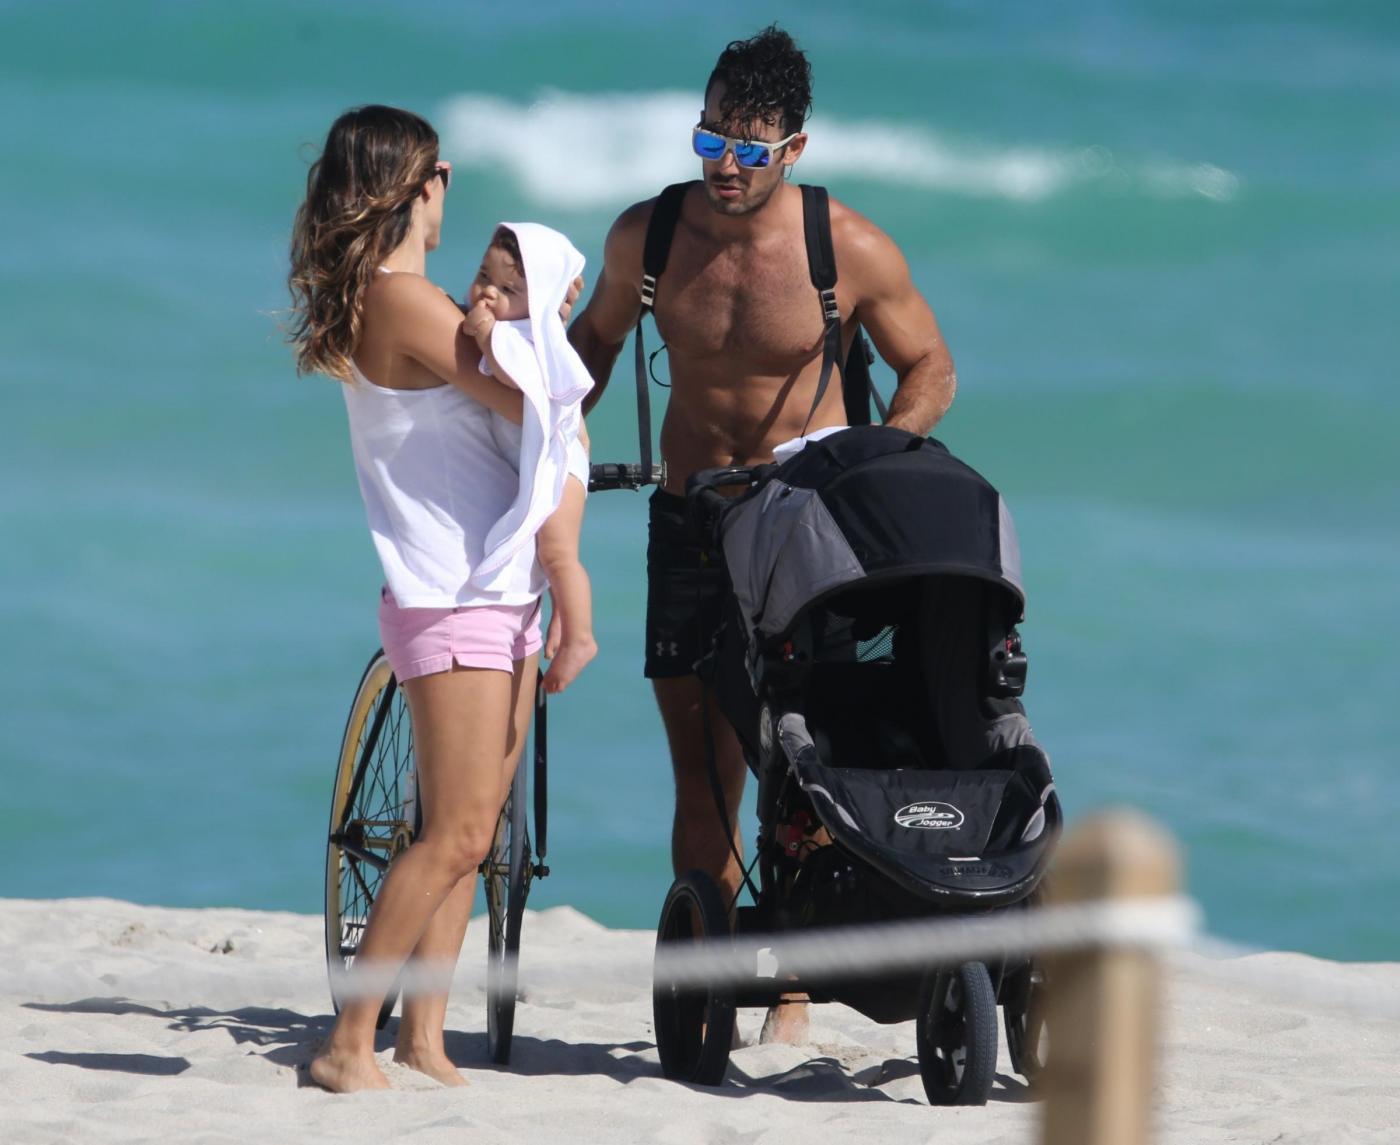 Lola Ponce e Aaron Diaz in spiaggia a Miami02